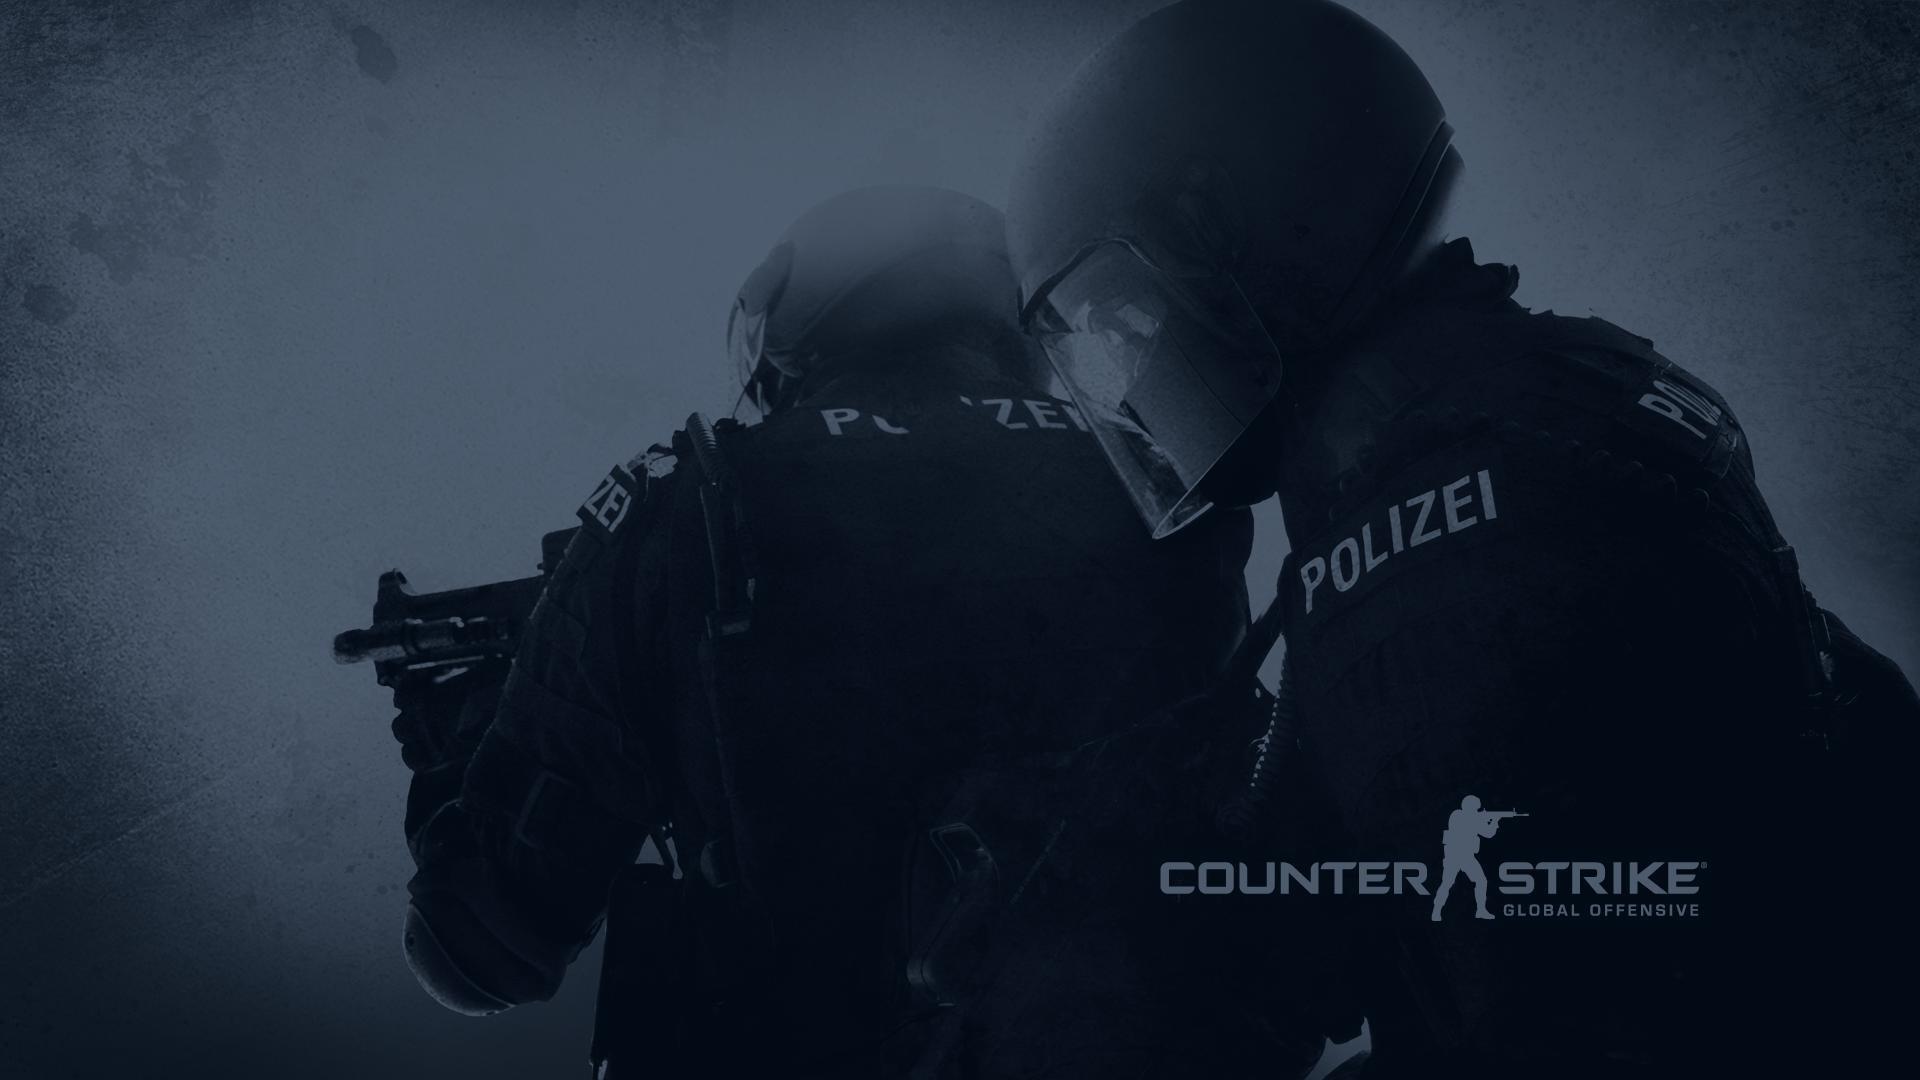 Counter Strike Full HD Wallpaper Fre #3615 HD Game .